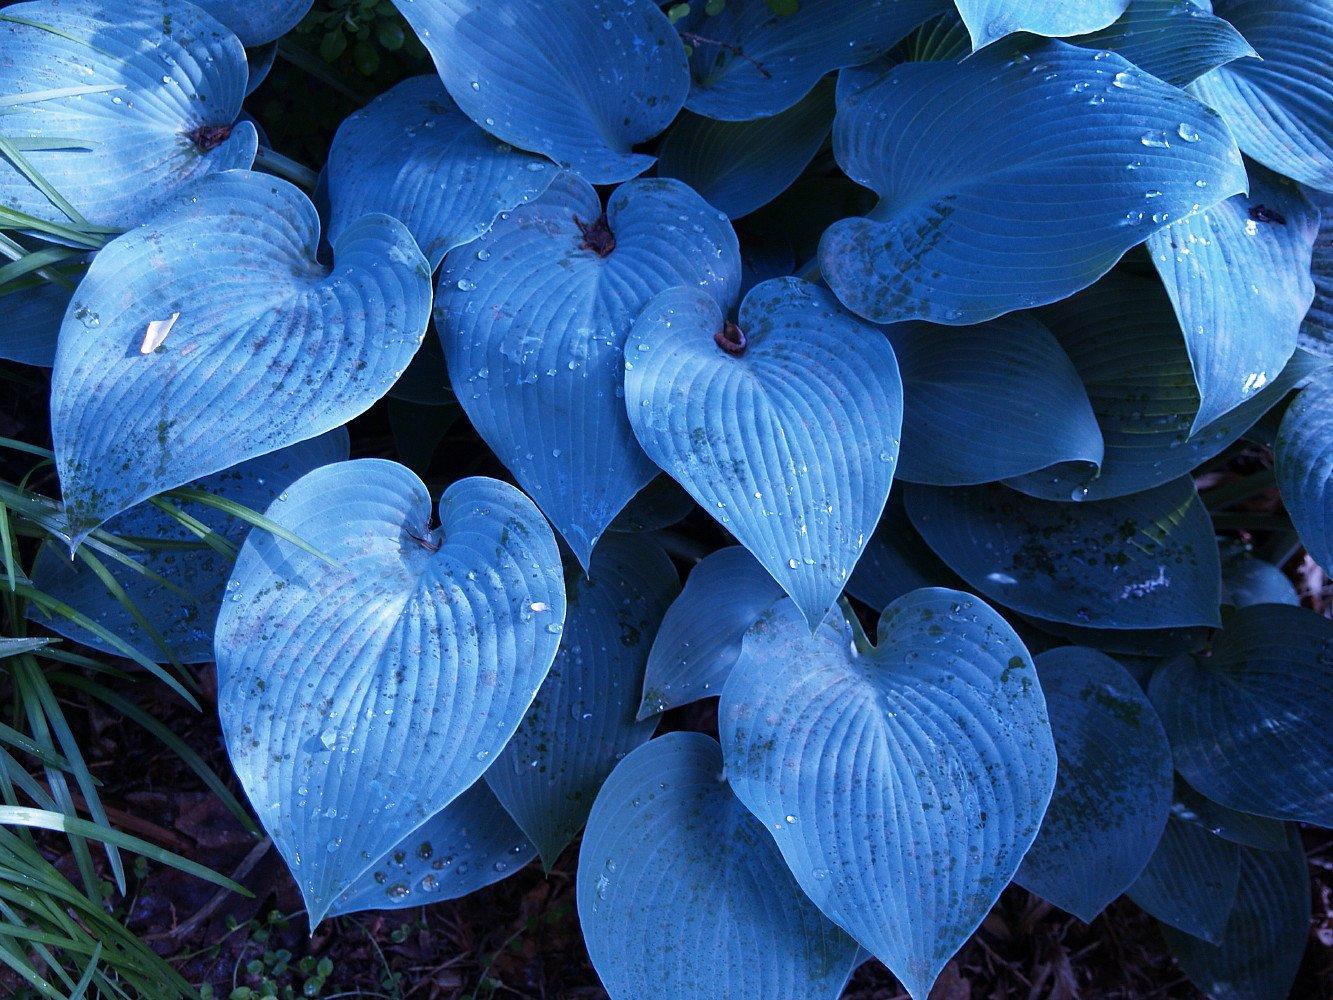 Halcyon Hosta - Gorgeous Medium Size Deep Green/Blue! - Live Plant - Quart Pot by Hirt's Gardens (Image #1)